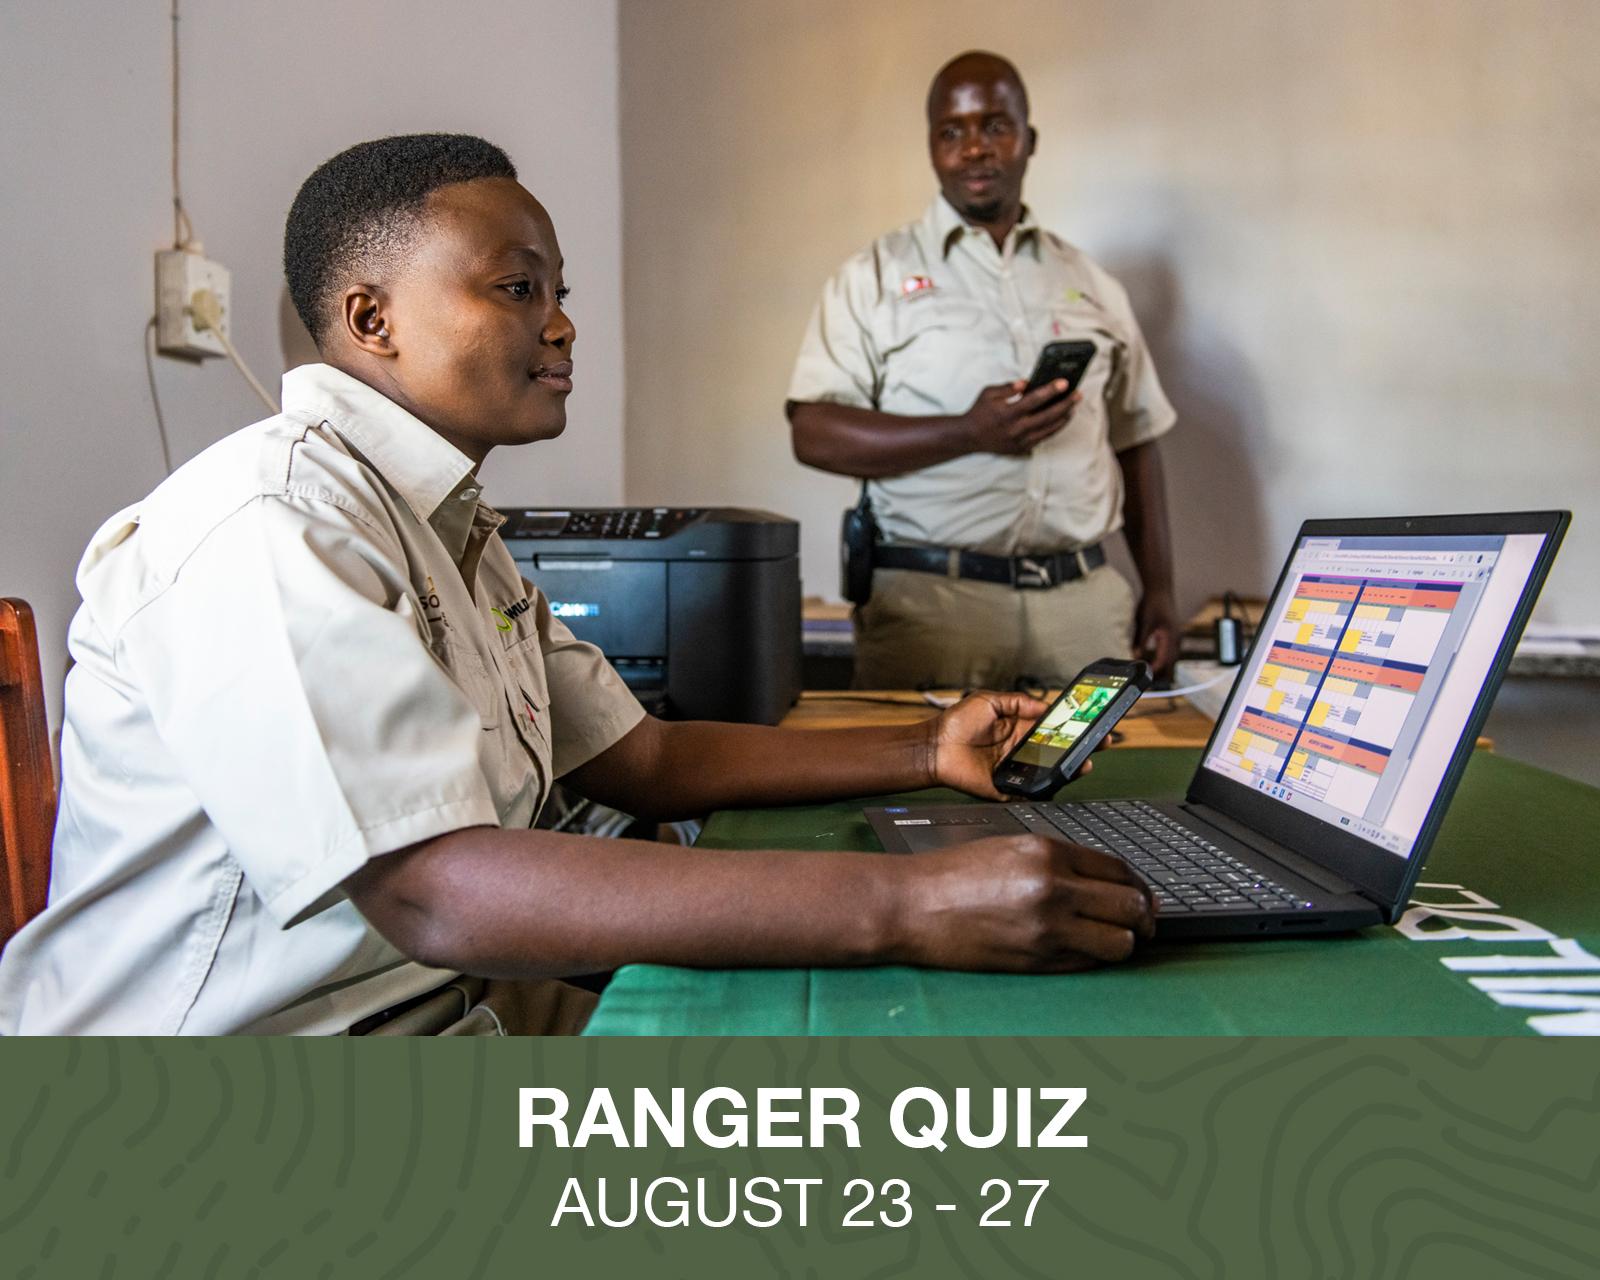 Ranger Quiz